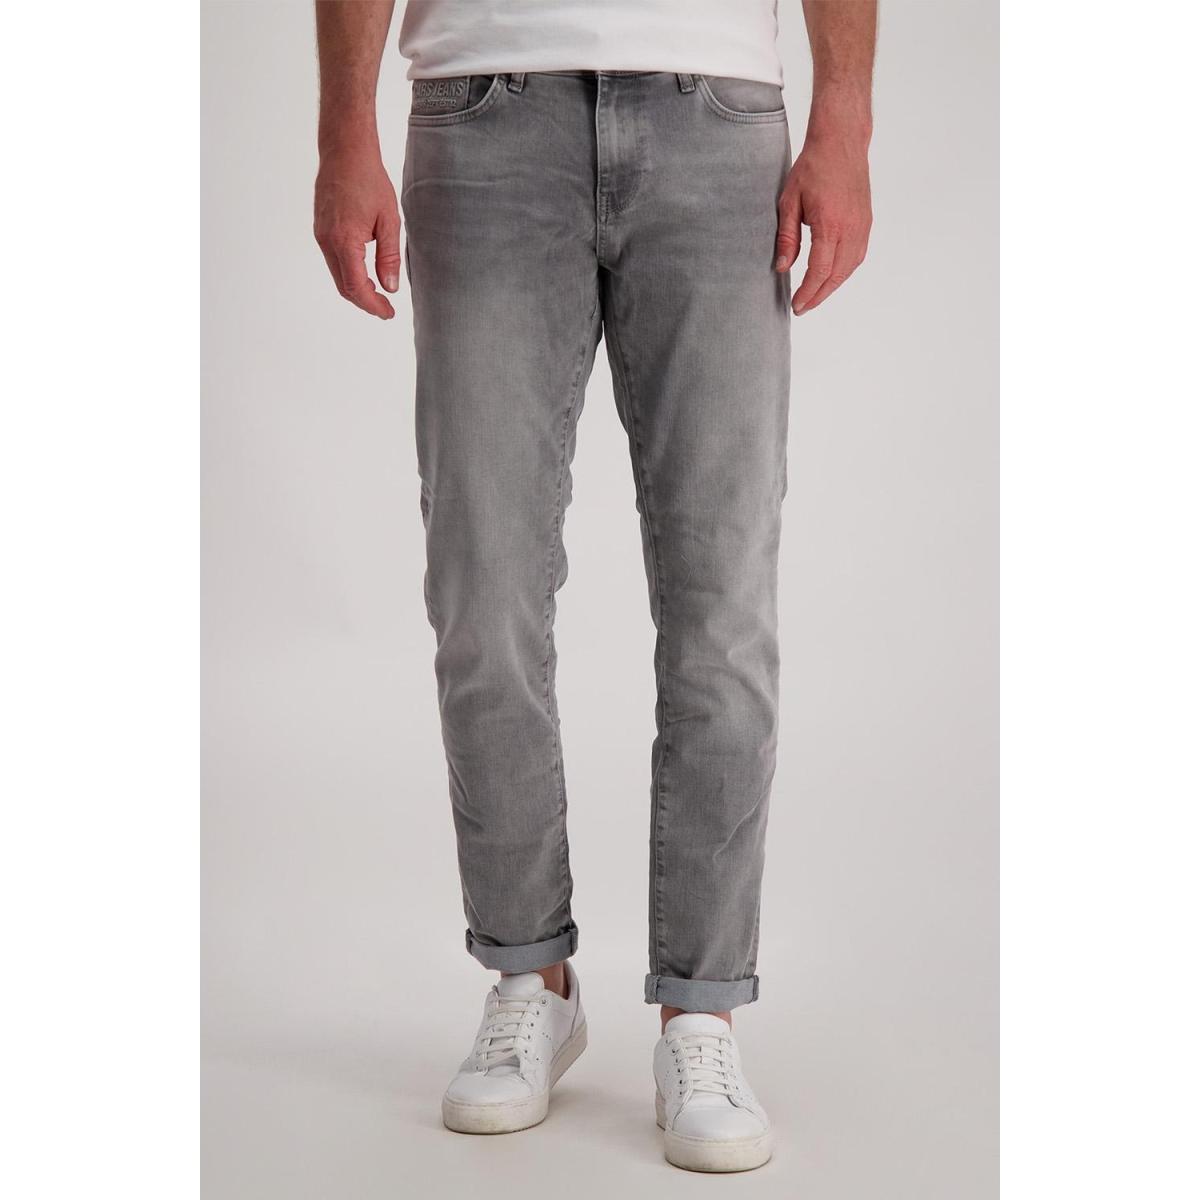 blast slim fit 78428 cars jeans 13 grey random used